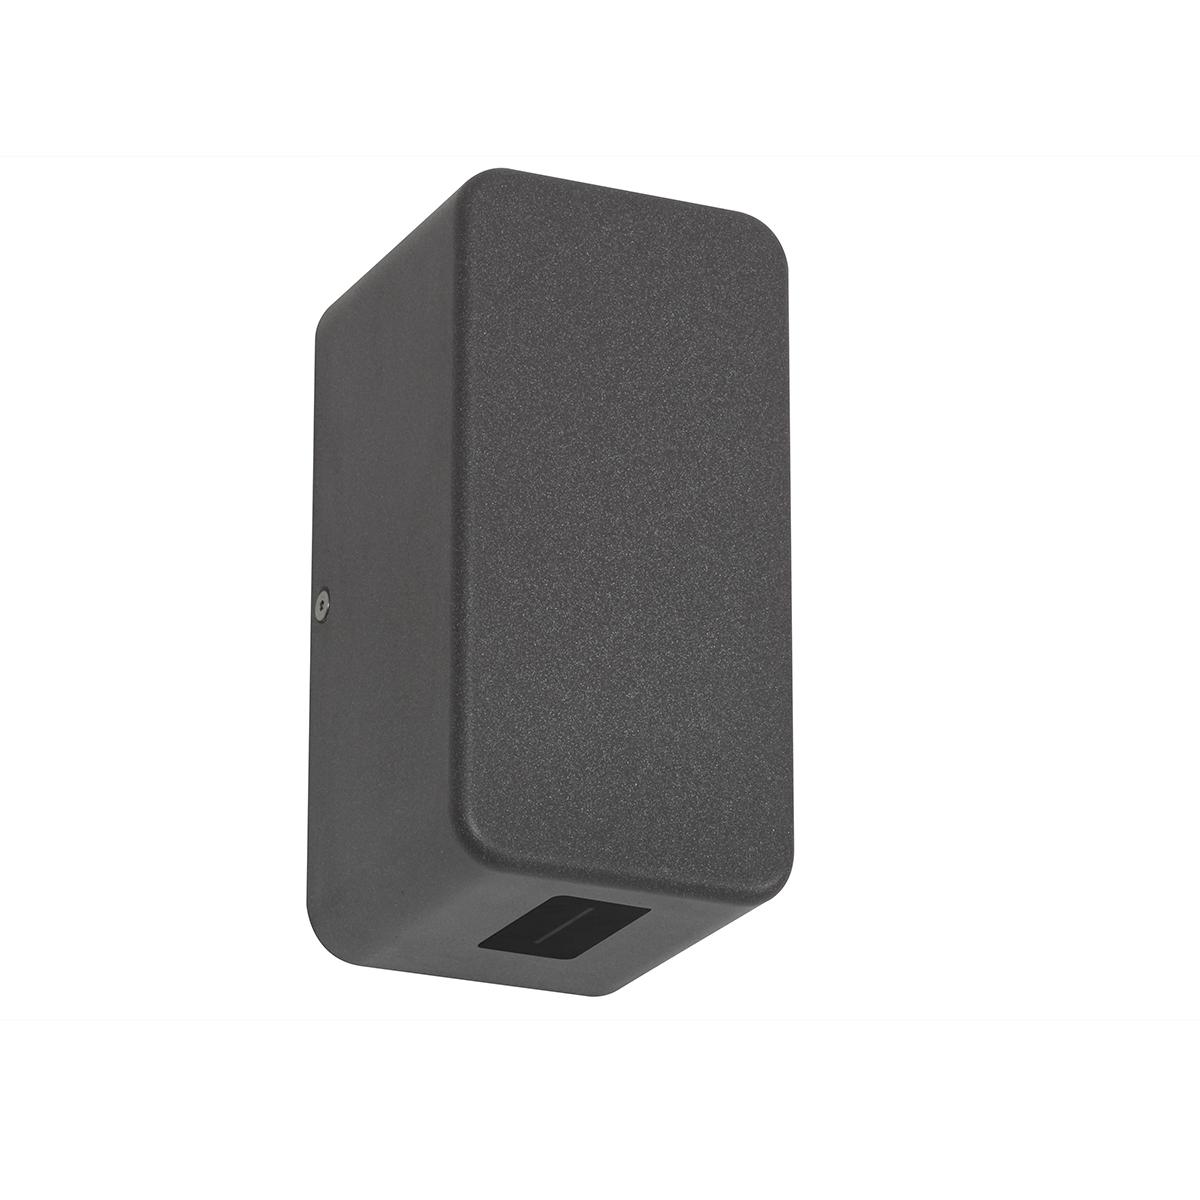 MiniModo V 2LE 180x90